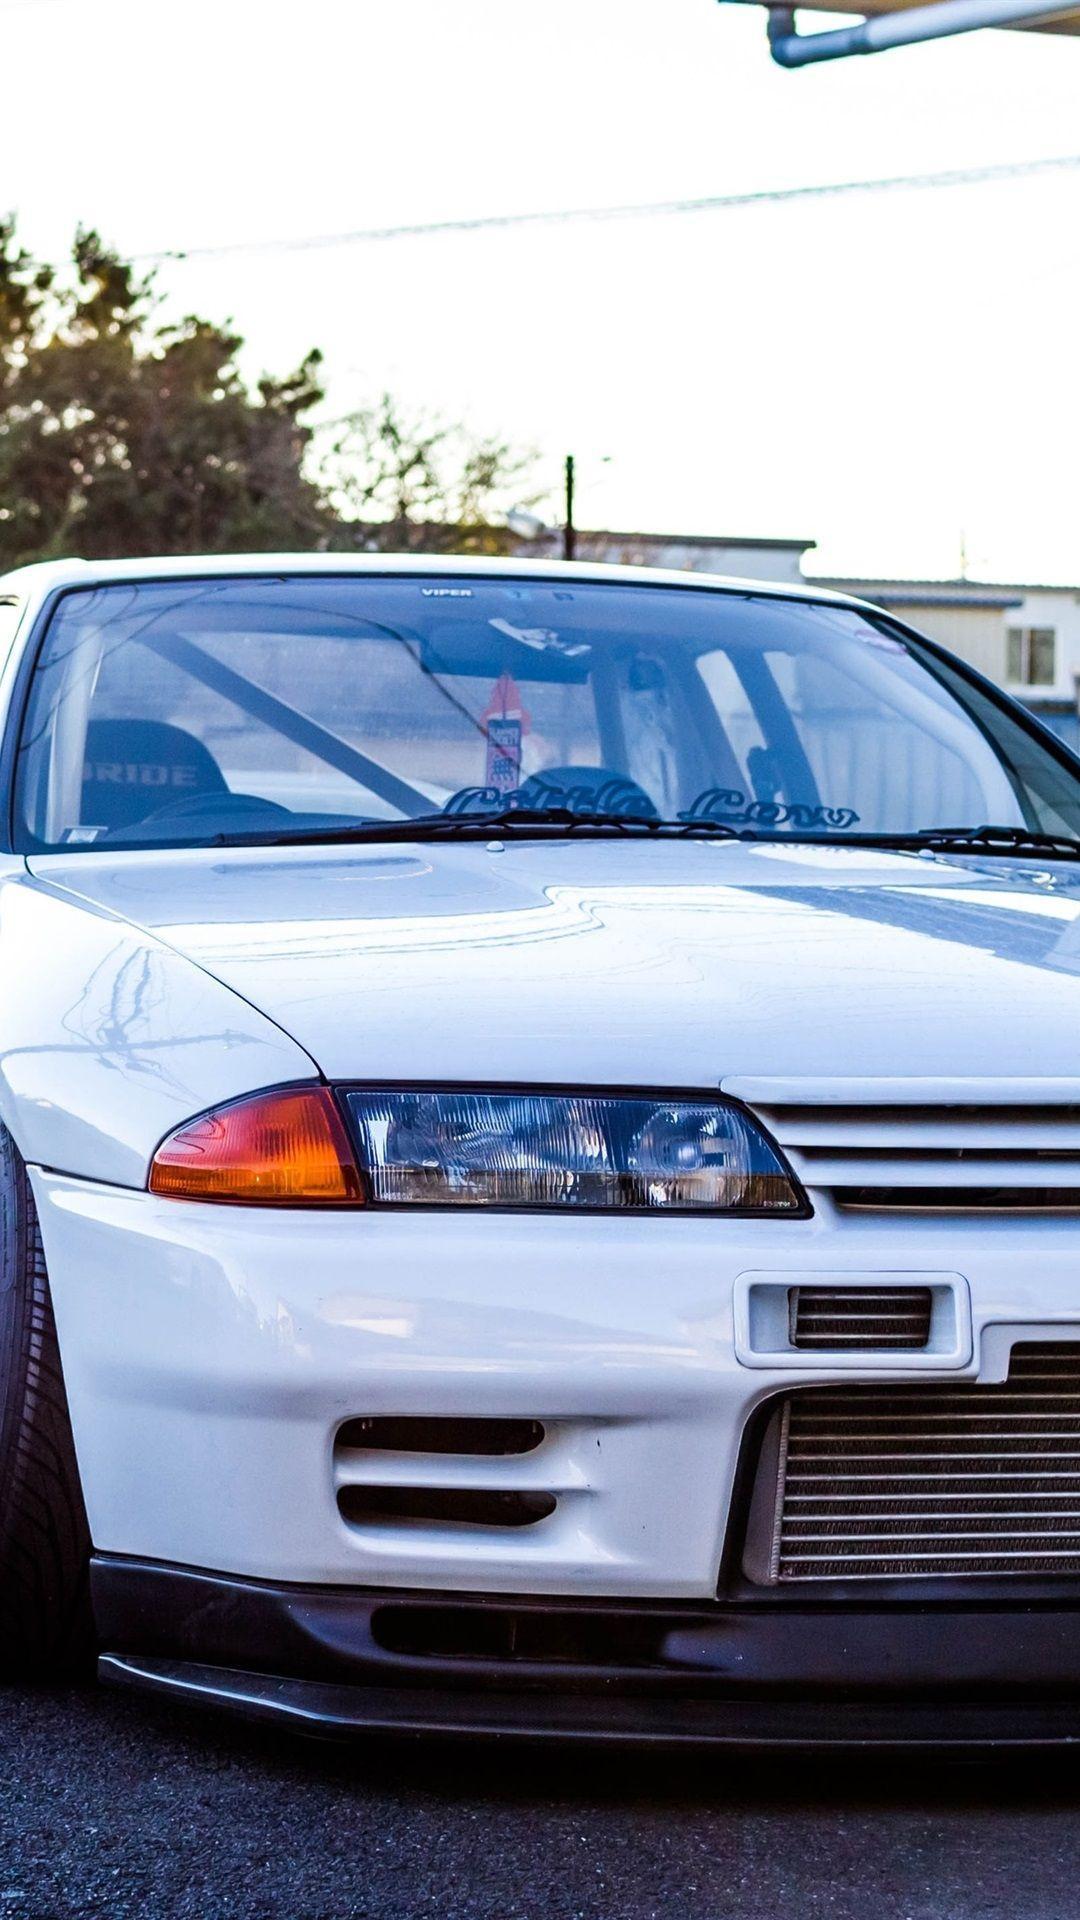 Nissan Gtr R32 Wallpapers Top Free Nissan Gtr R32 Backgrounds Wallpaperaccess